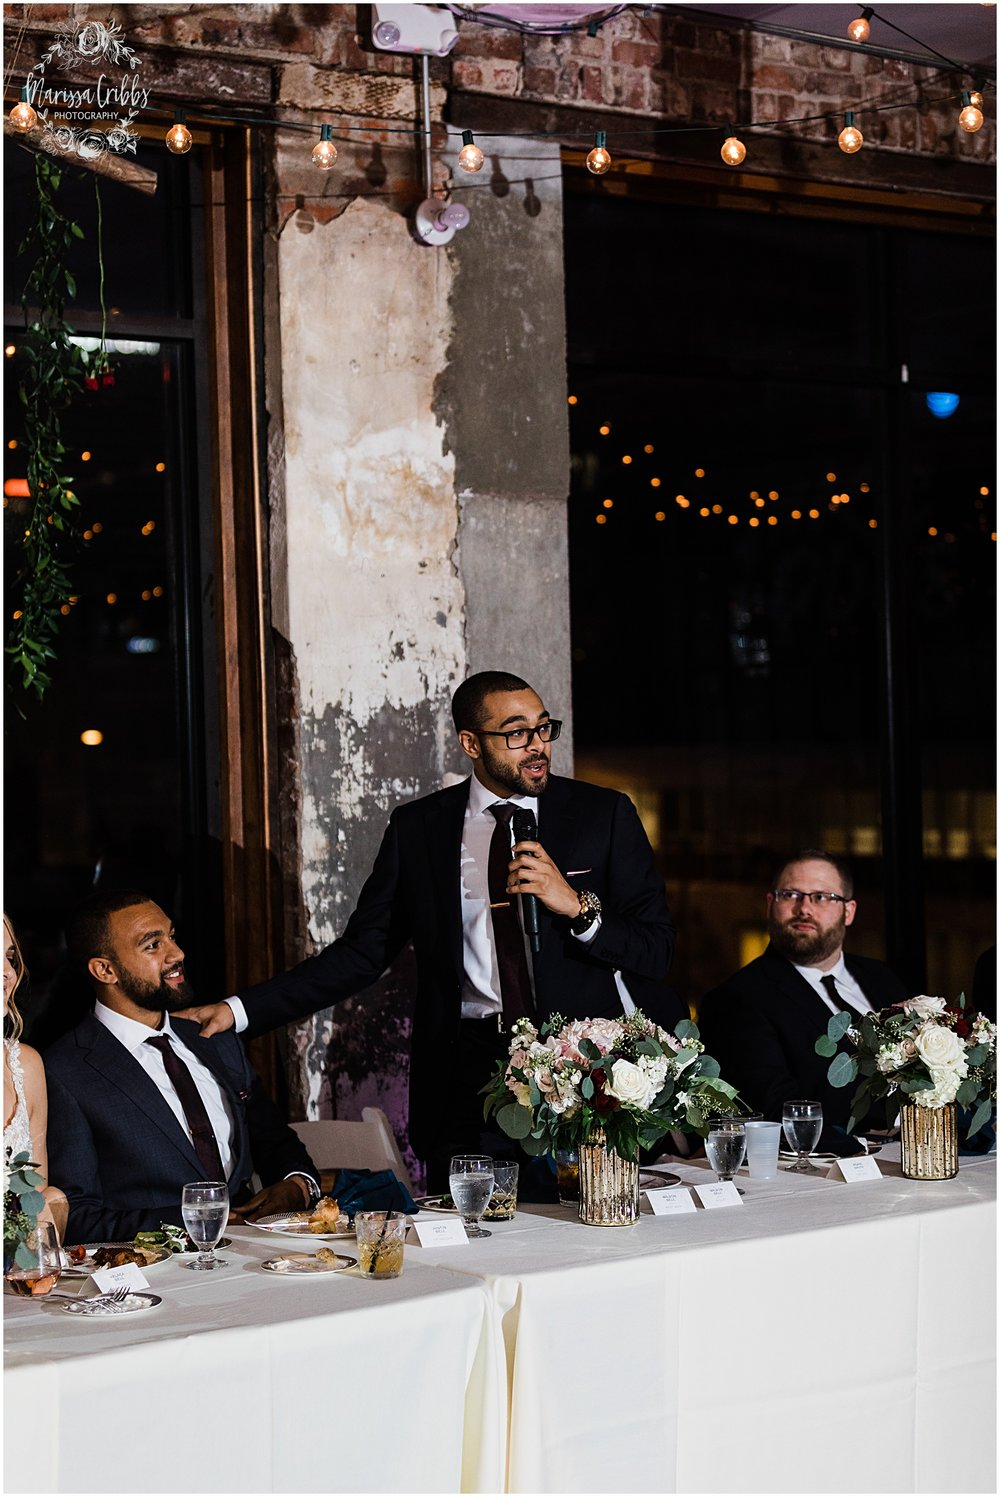 BAUER WEDDING | KELSEA & JUSTIN | MARISSA CRIBBS PHOTOGRAPHY_6588.jpg